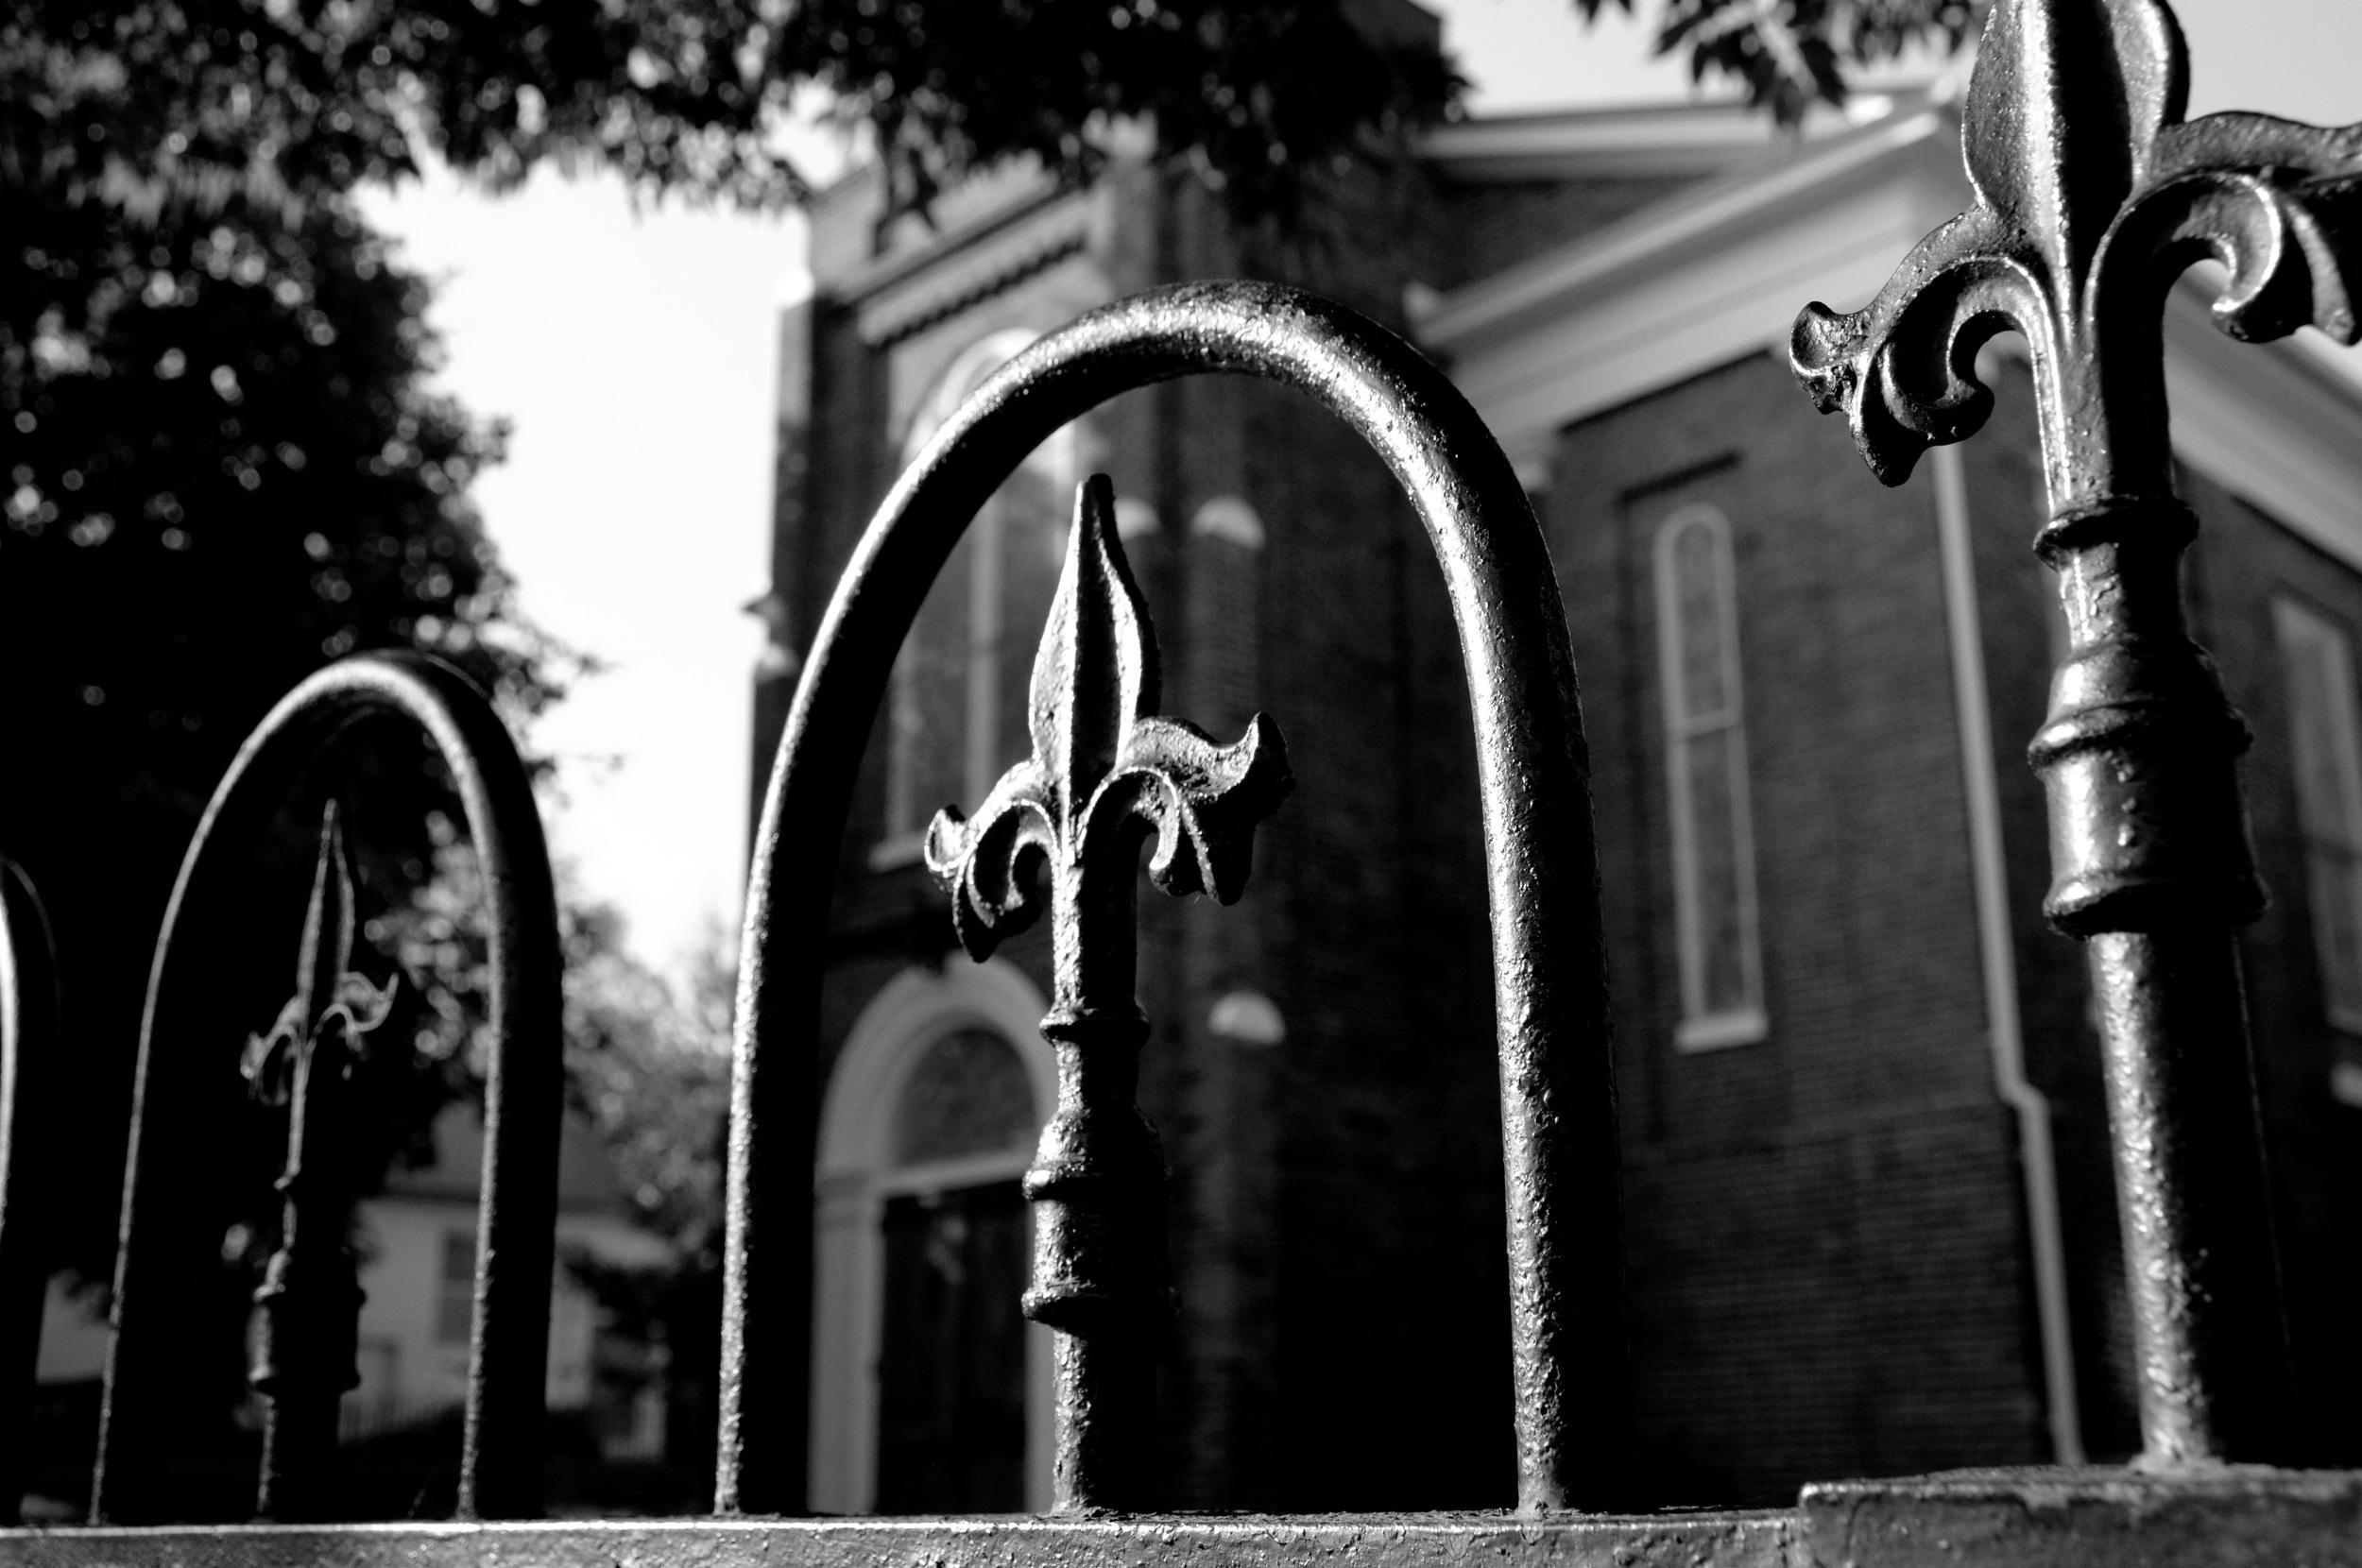 Church Gates - Nikon D90